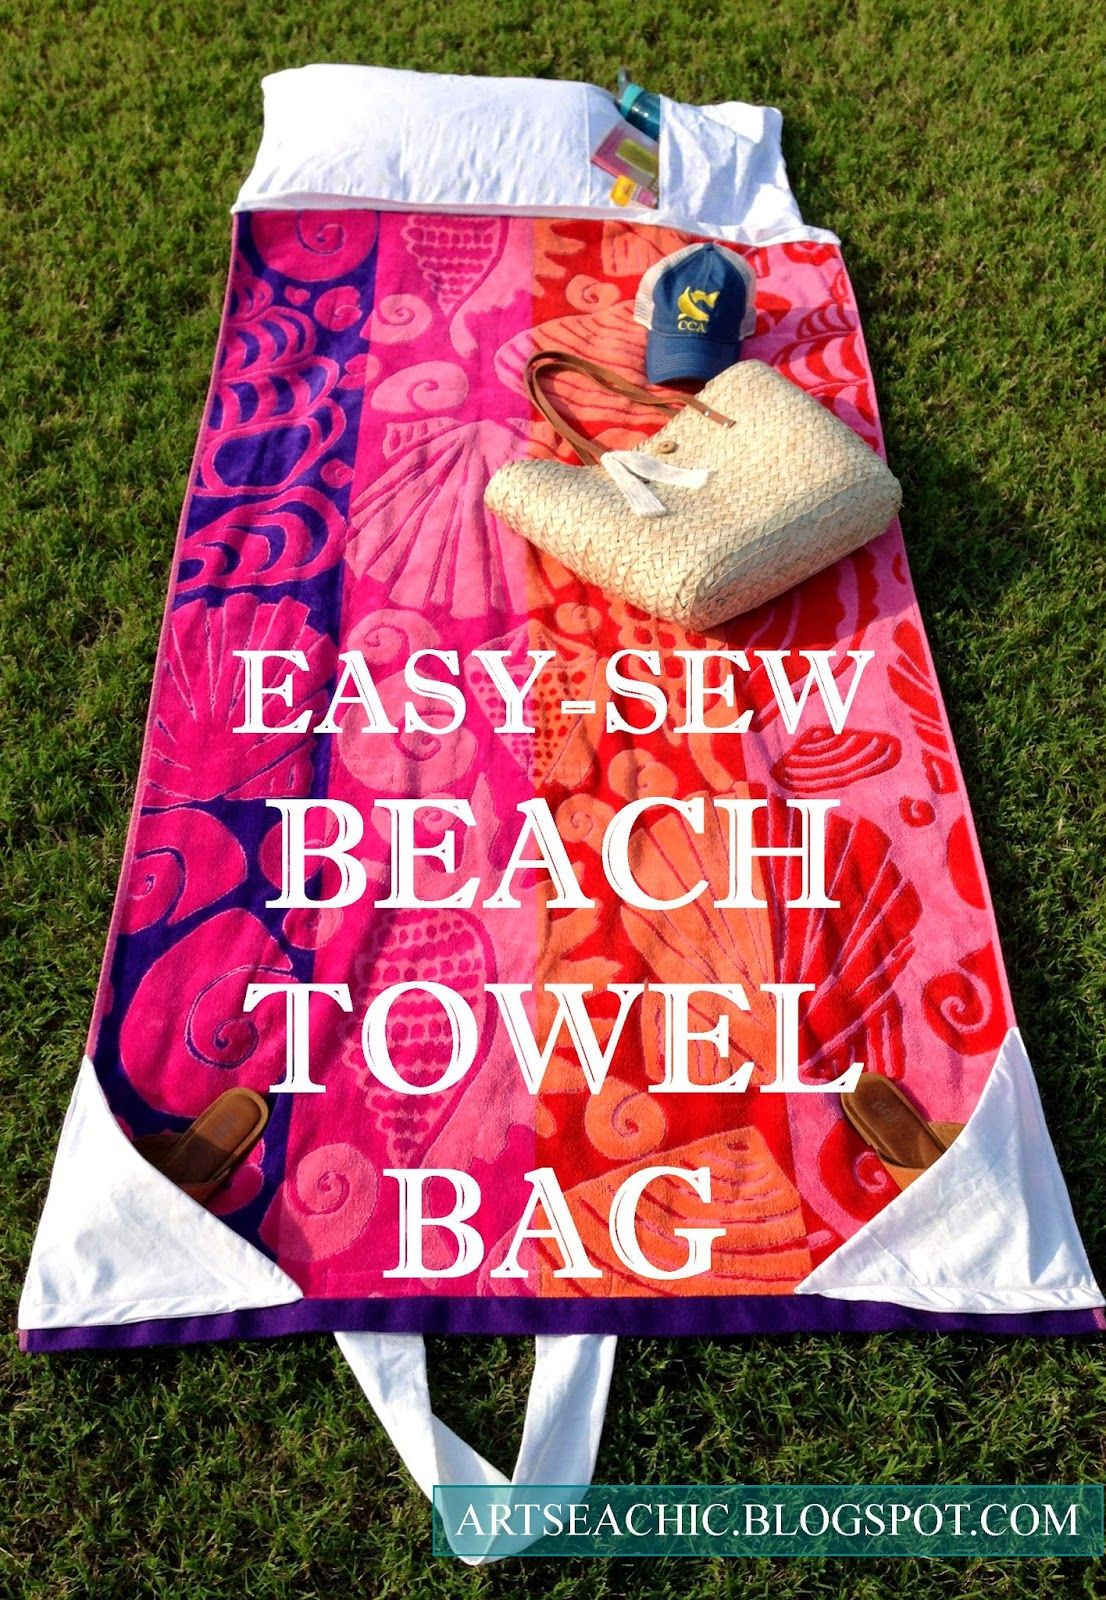 BLOGGED}: Easy-Sew Beach Towel Bag | ARTSEA CHIC Blog | Pinterest ...